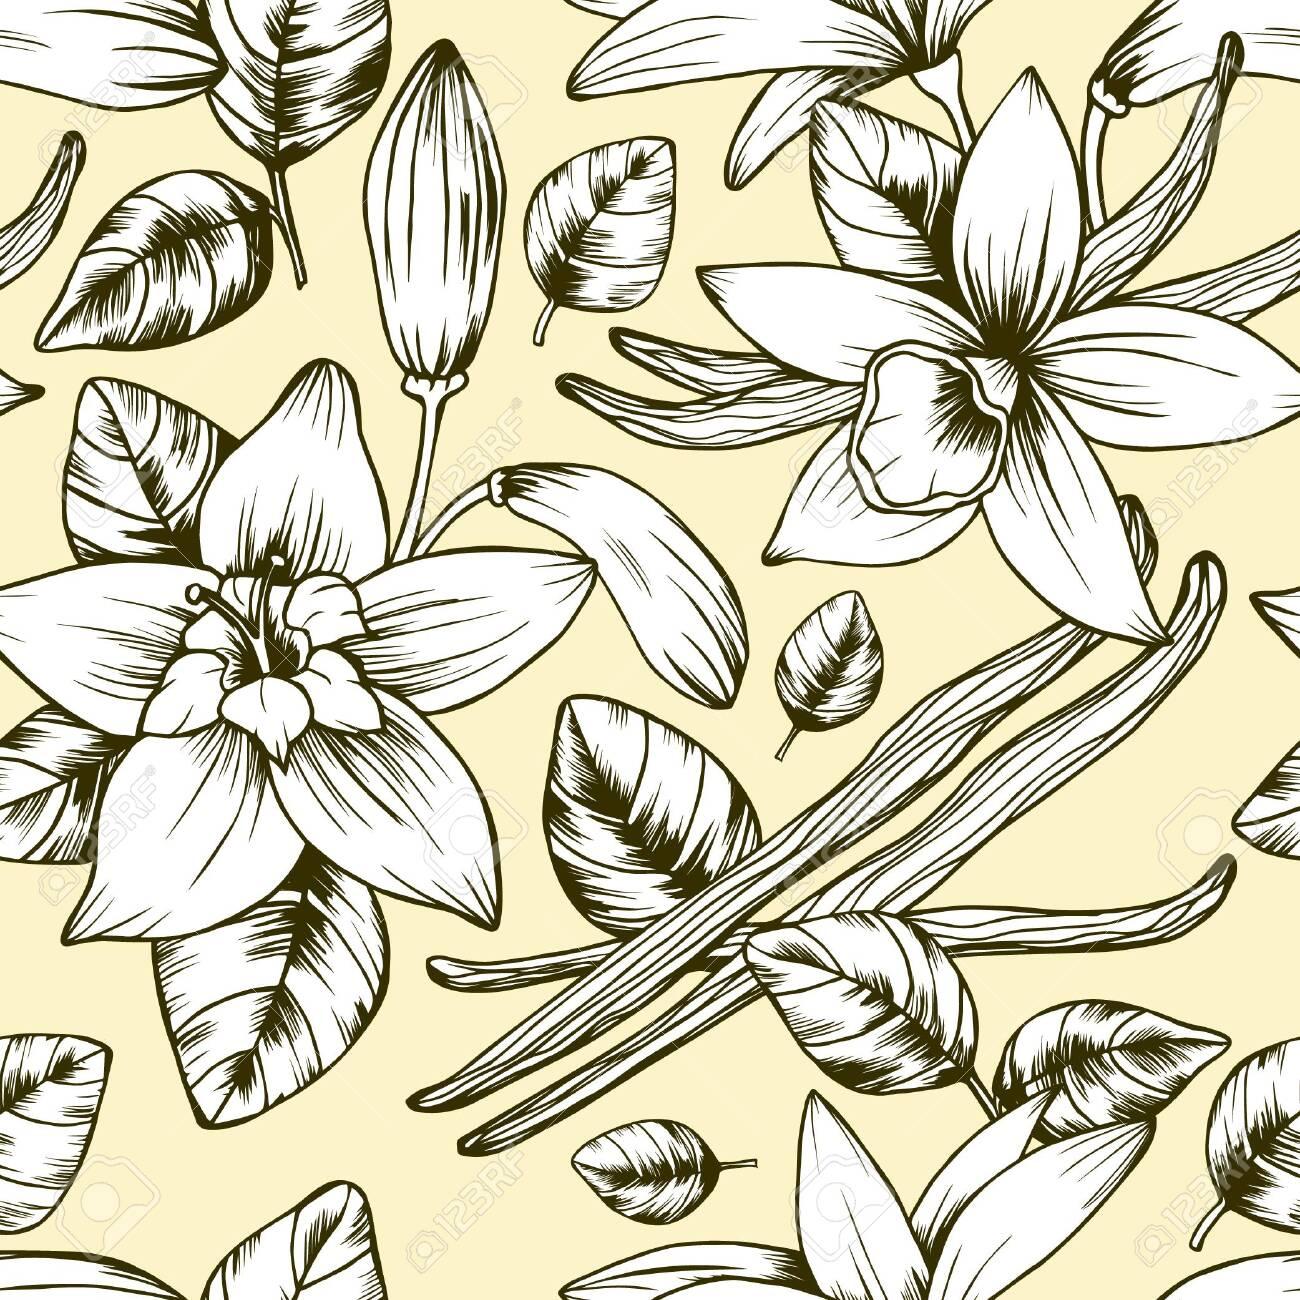 Seamless vector vintage floral pattern - 134202941